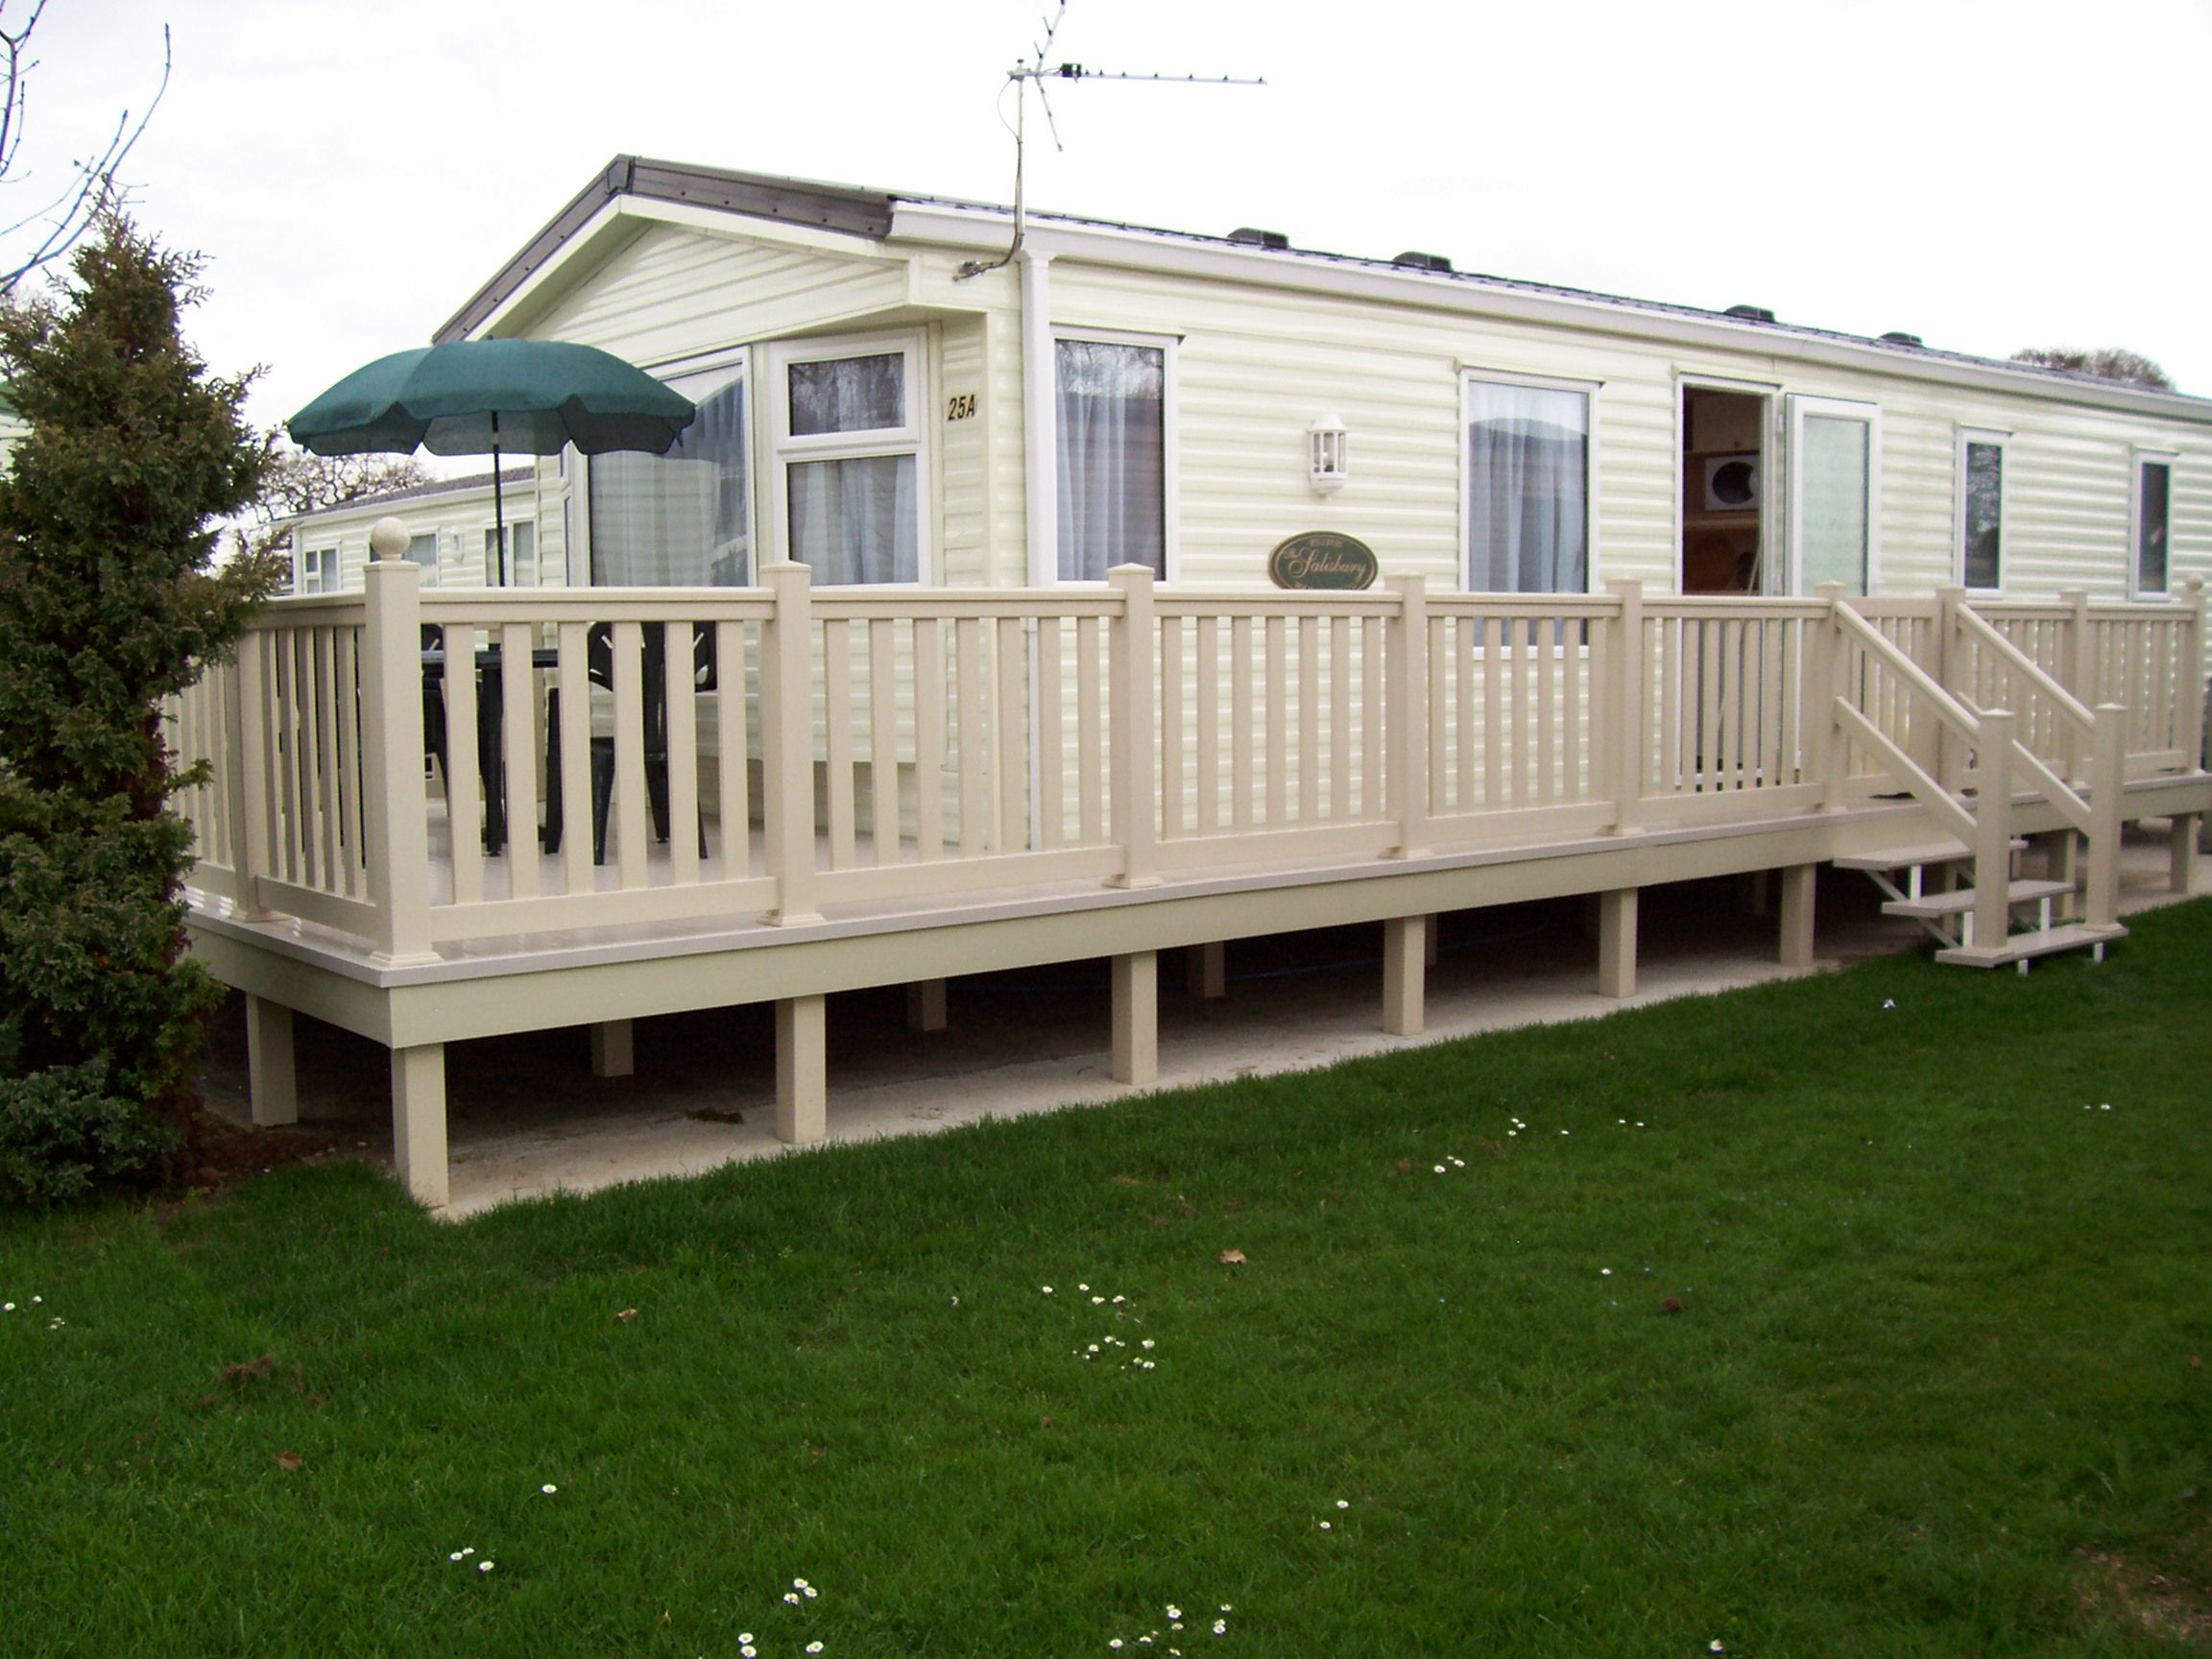 Best Kitchen Gallery: Mobile Home Designs Stairs Pinned By Modlar Cabins of Mobile Home Designs  on rachelxblog.com